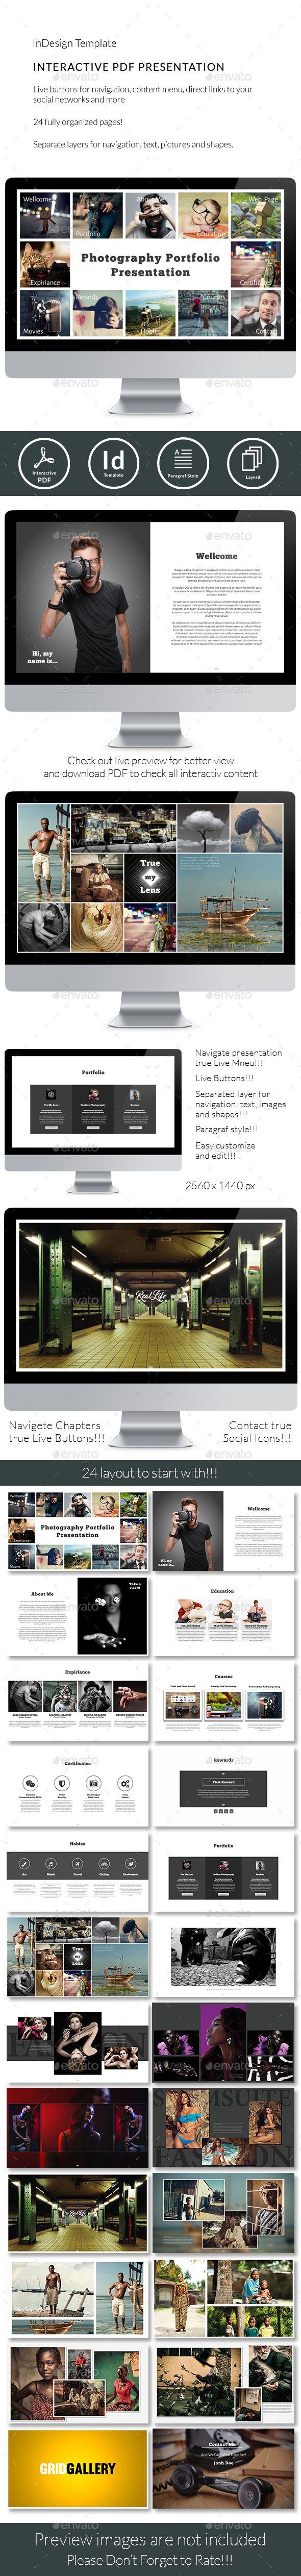 Interactive PDF Photographer Portfolio No7